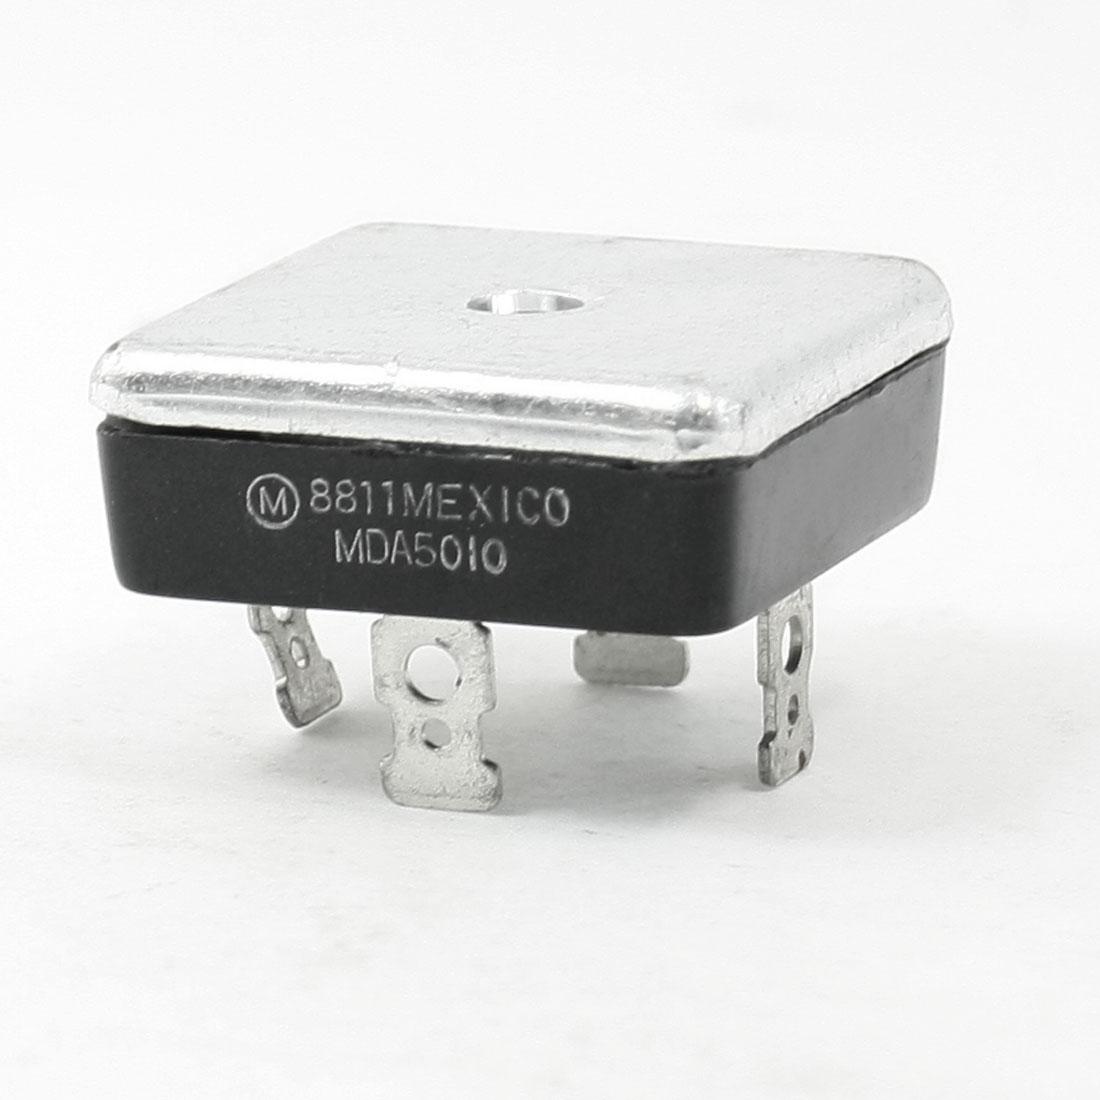 MDA5010 1KV 50A Single Phase Bridge Rectifier Half-Wave Silver Tone Black